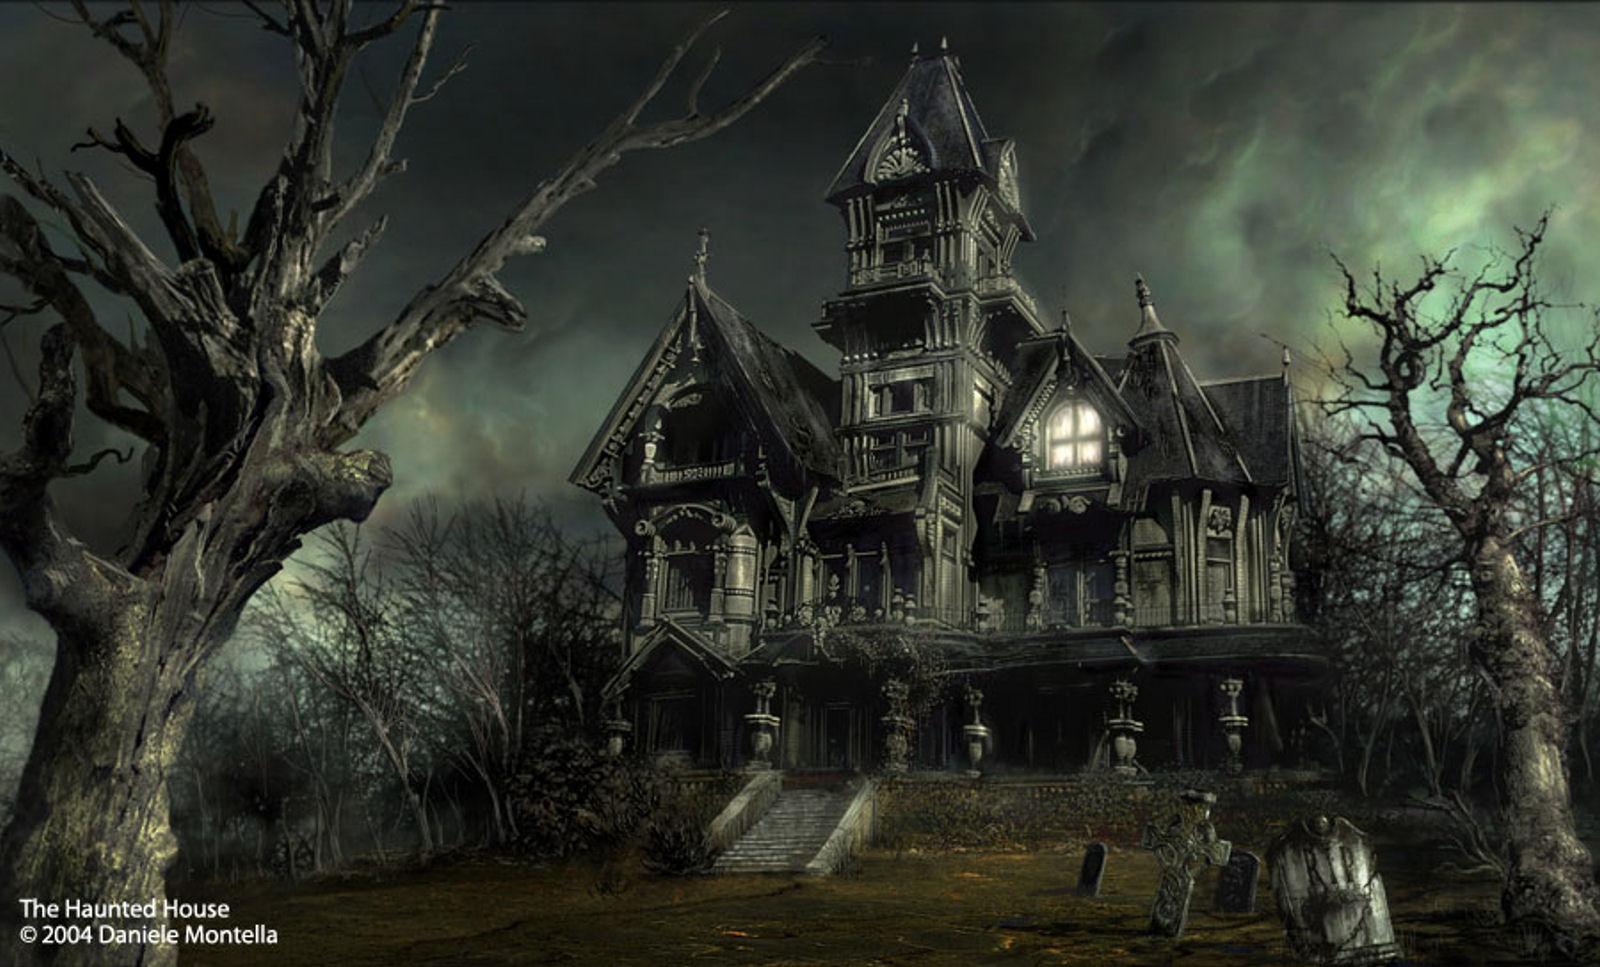 FunMozar Halloween Hunted House Graveyard Wallpapers 1600x967